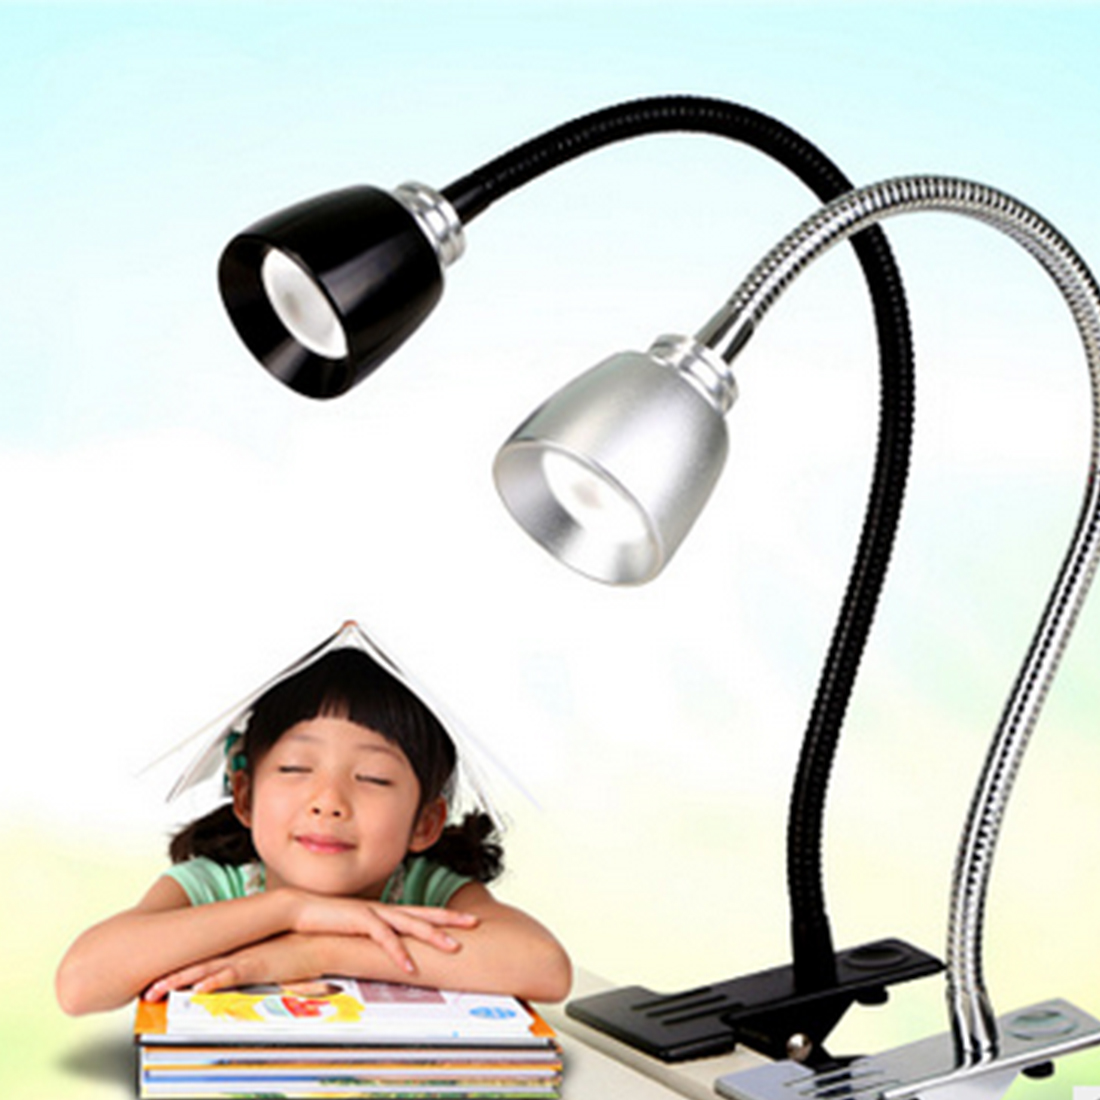 Clip Holder USB Power LED Desk Lamp Flexible Table Lamp Bedside Lamp Book Light For Bedroom Living Room Home Decoration